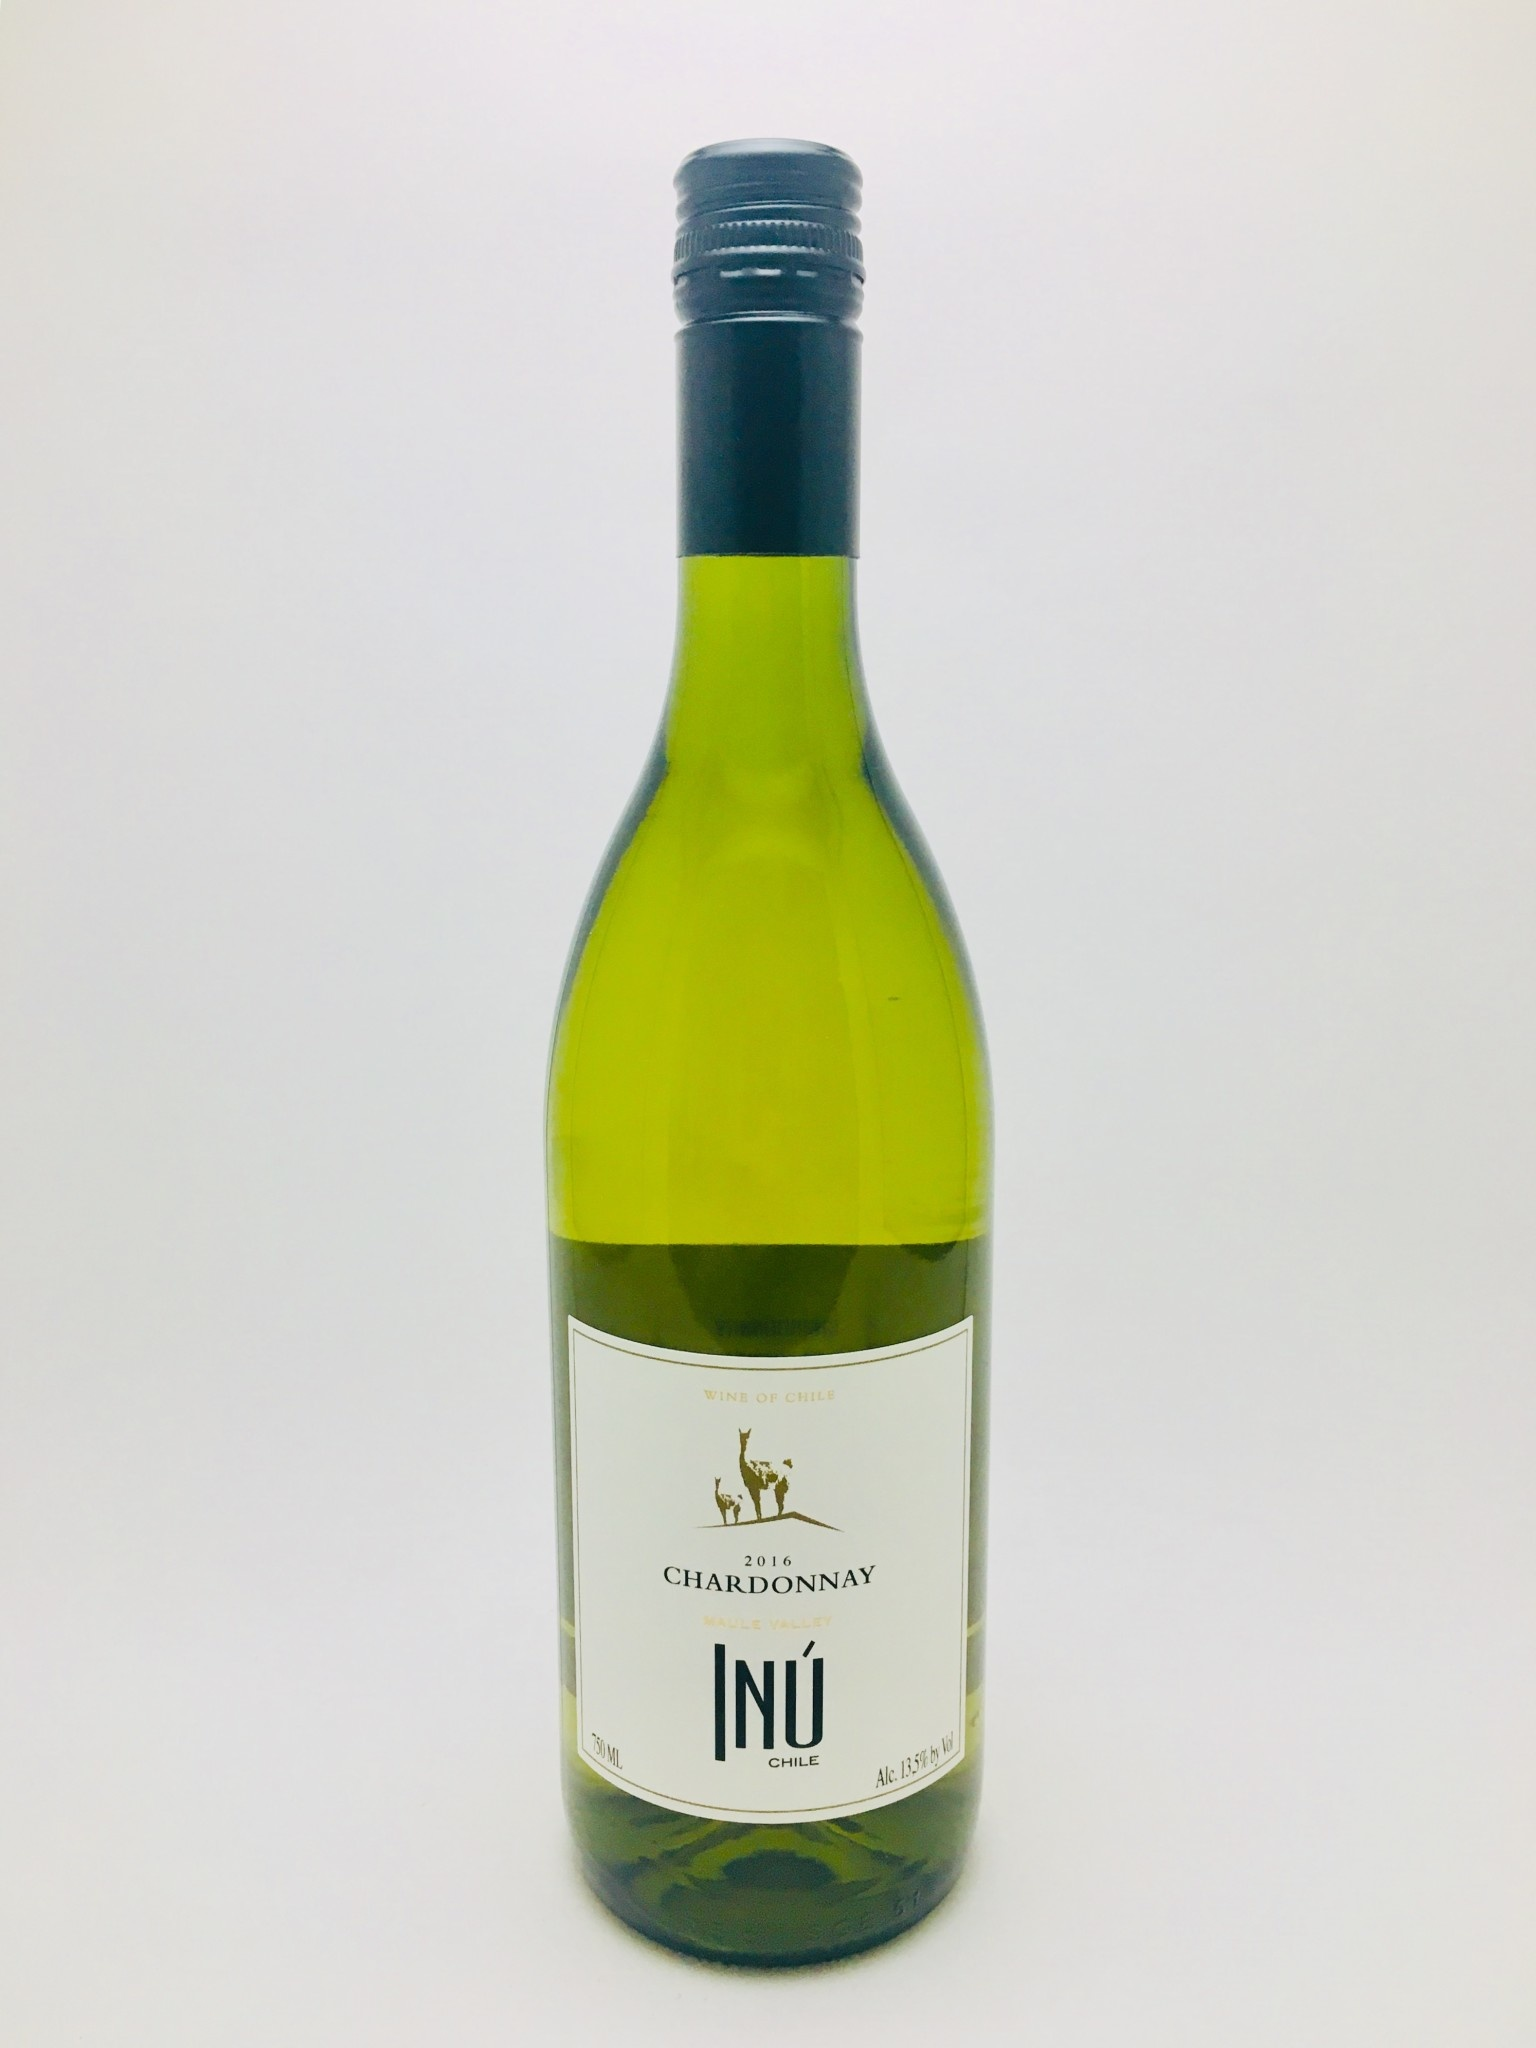 Inu Chardonnay Maule Valley Chile 2016